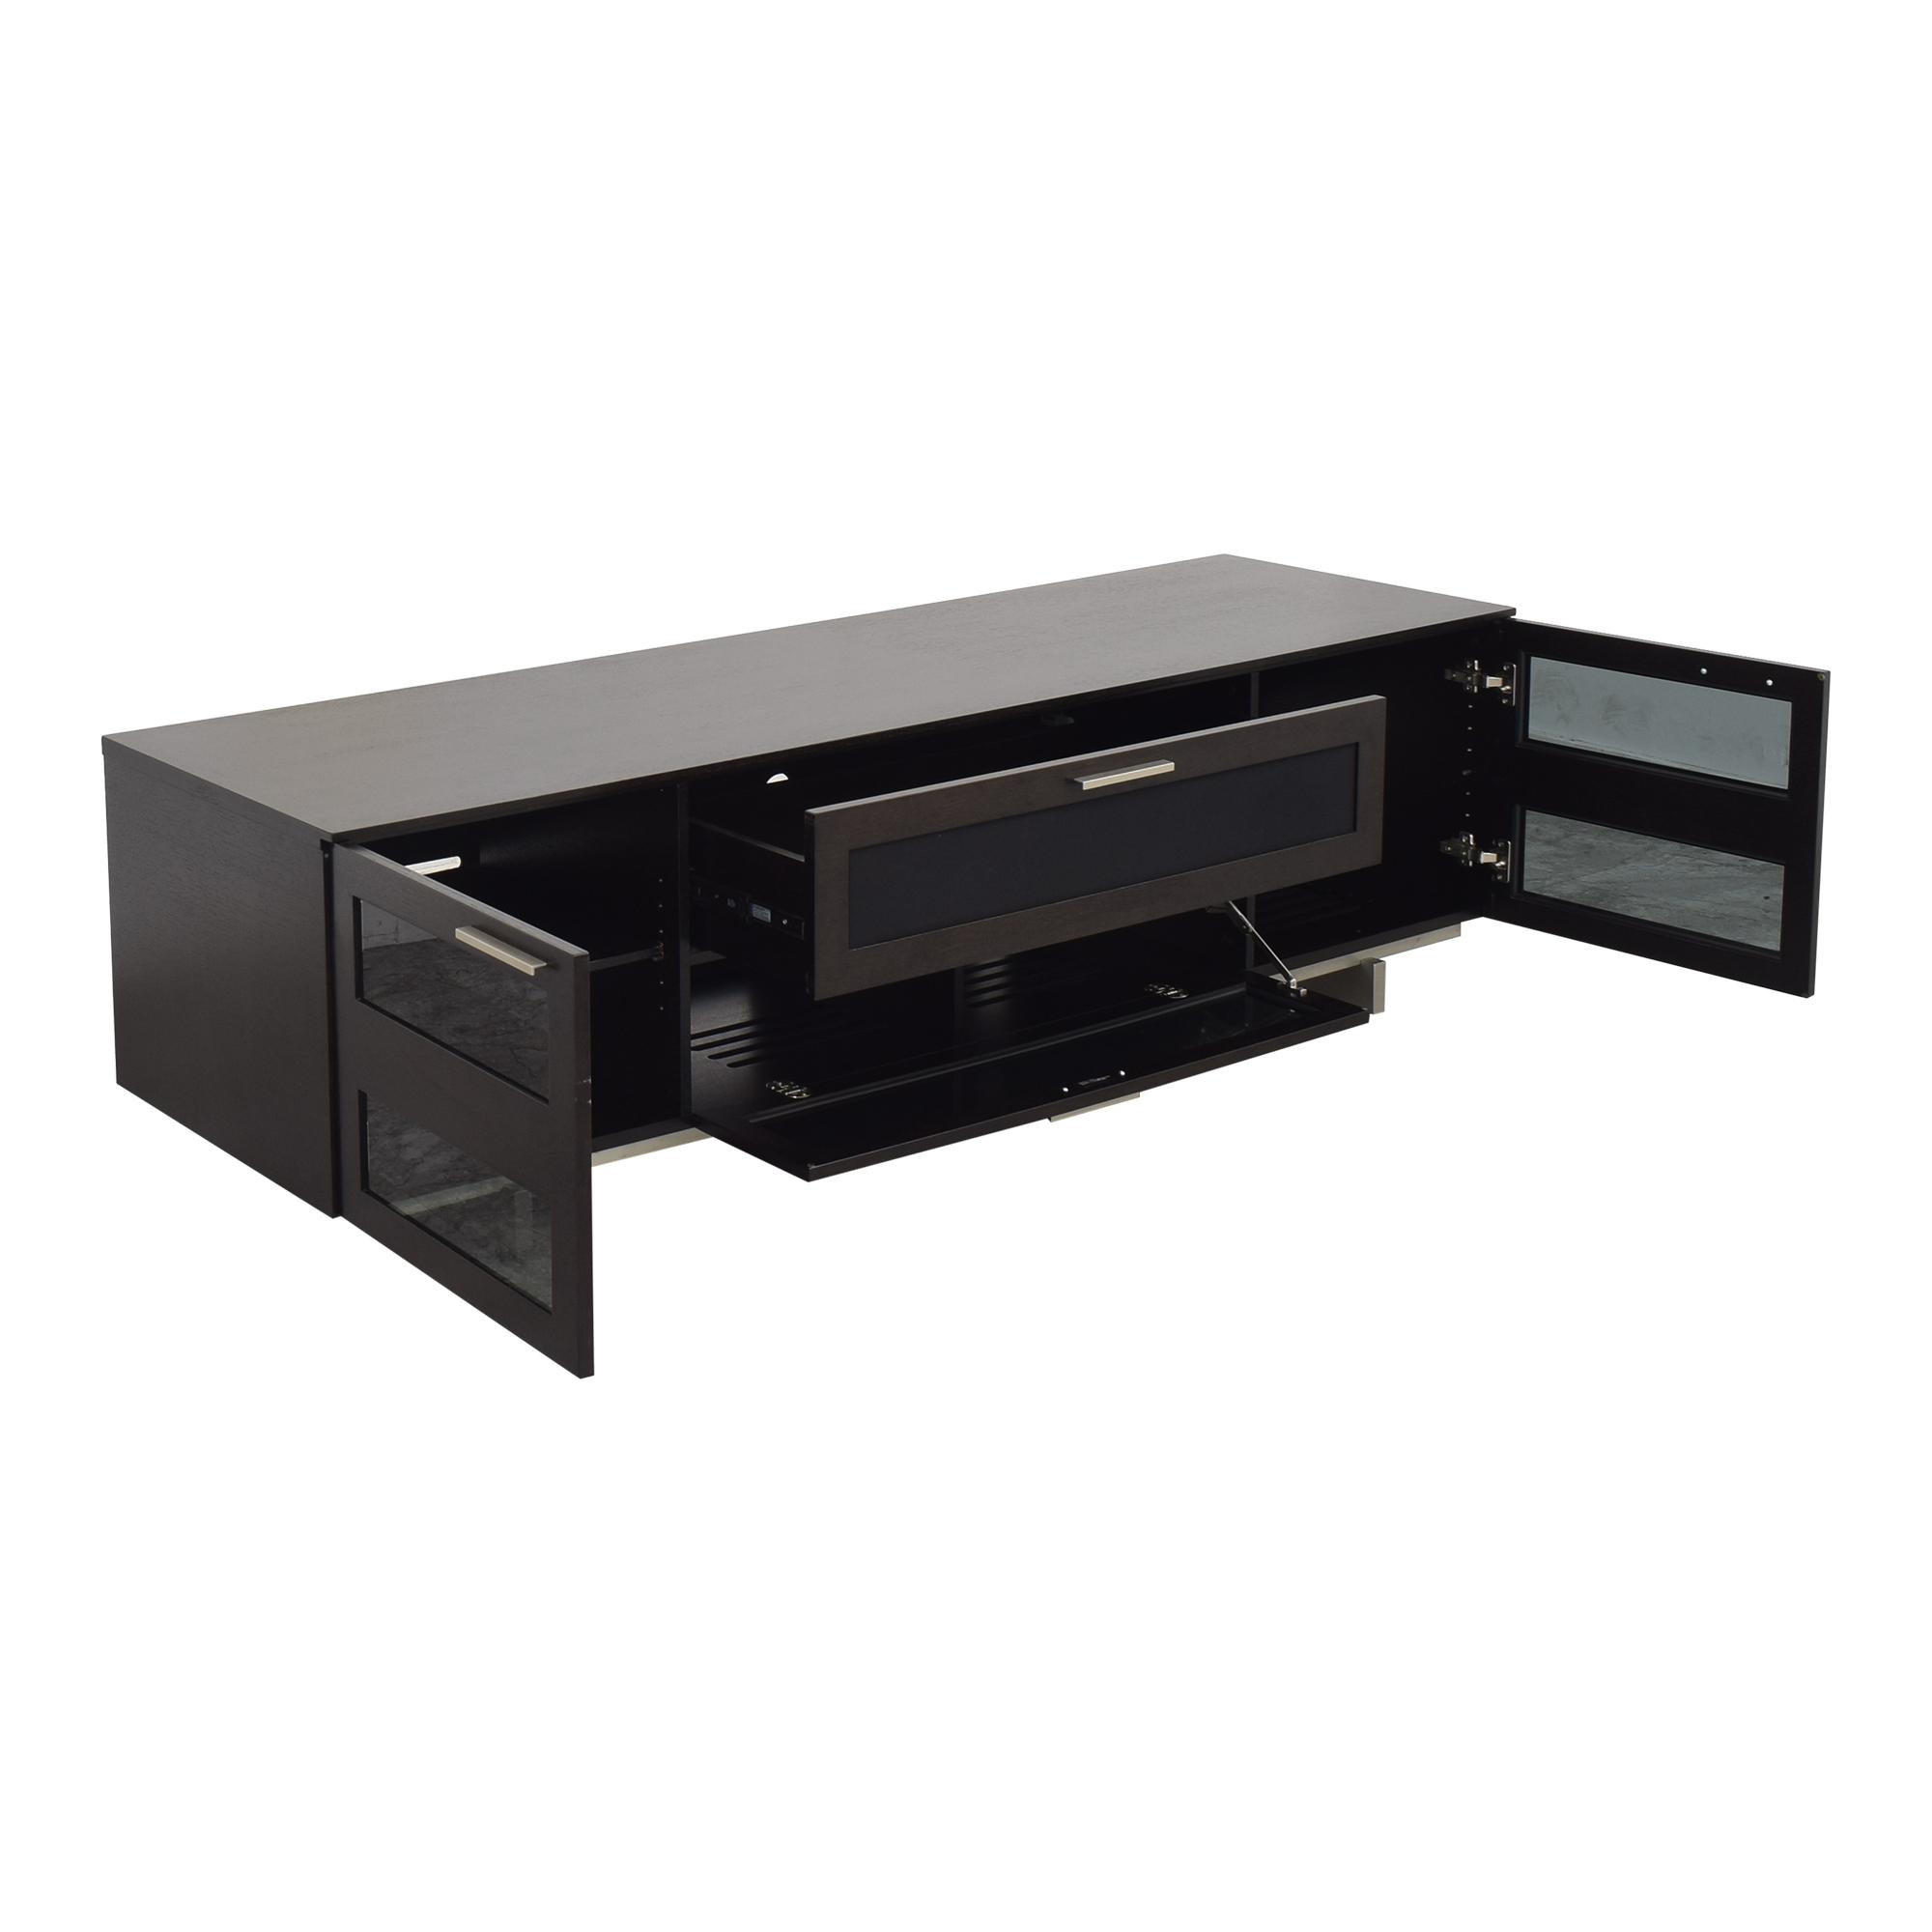 BDI Furniture BDI Avion Noir 8937 Media Unit dark brown